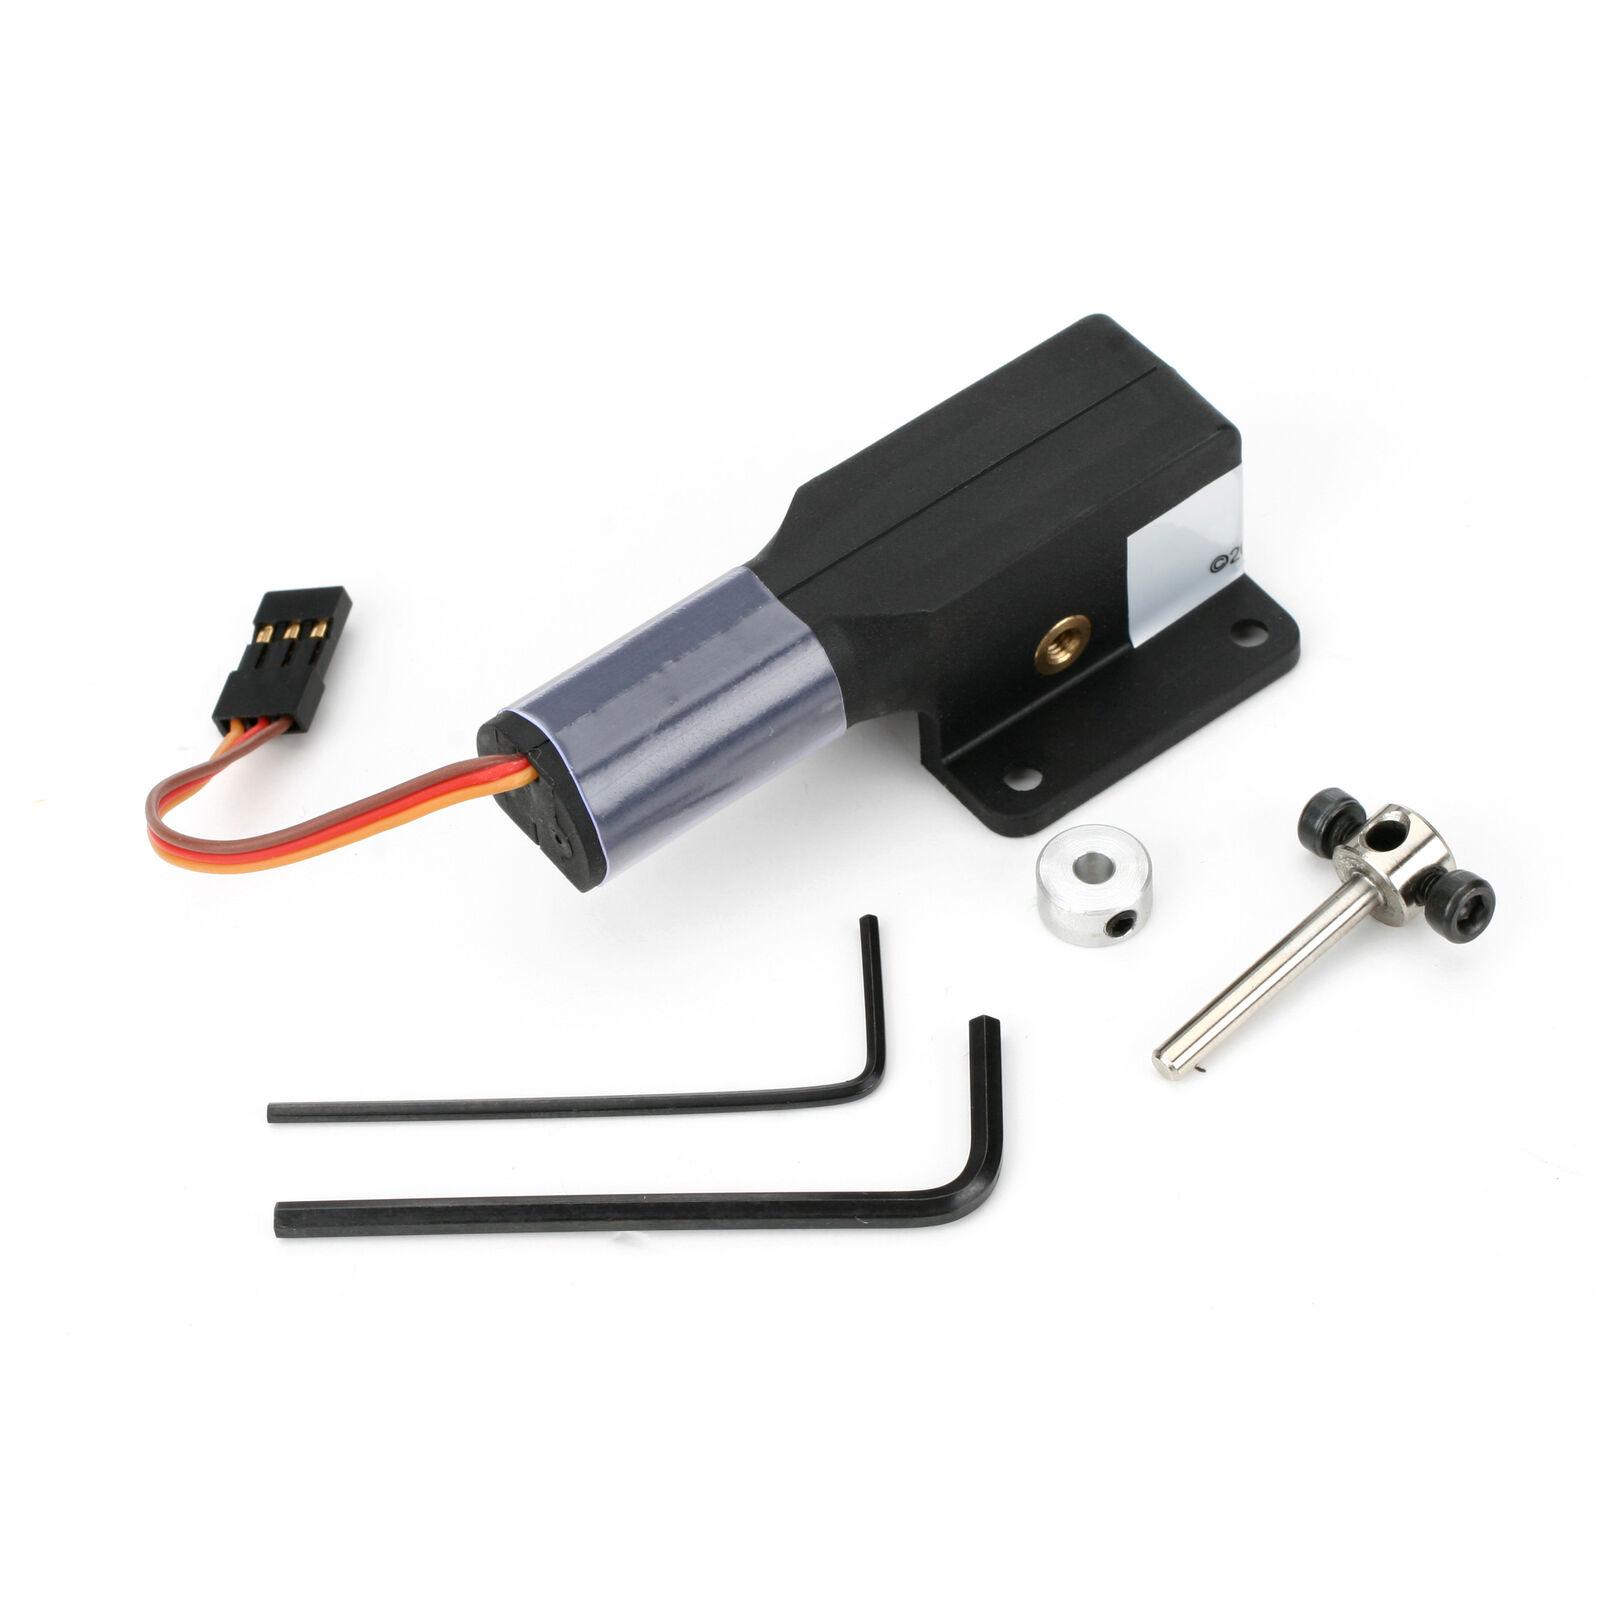 10 - 15 Main Electric Retract Unit